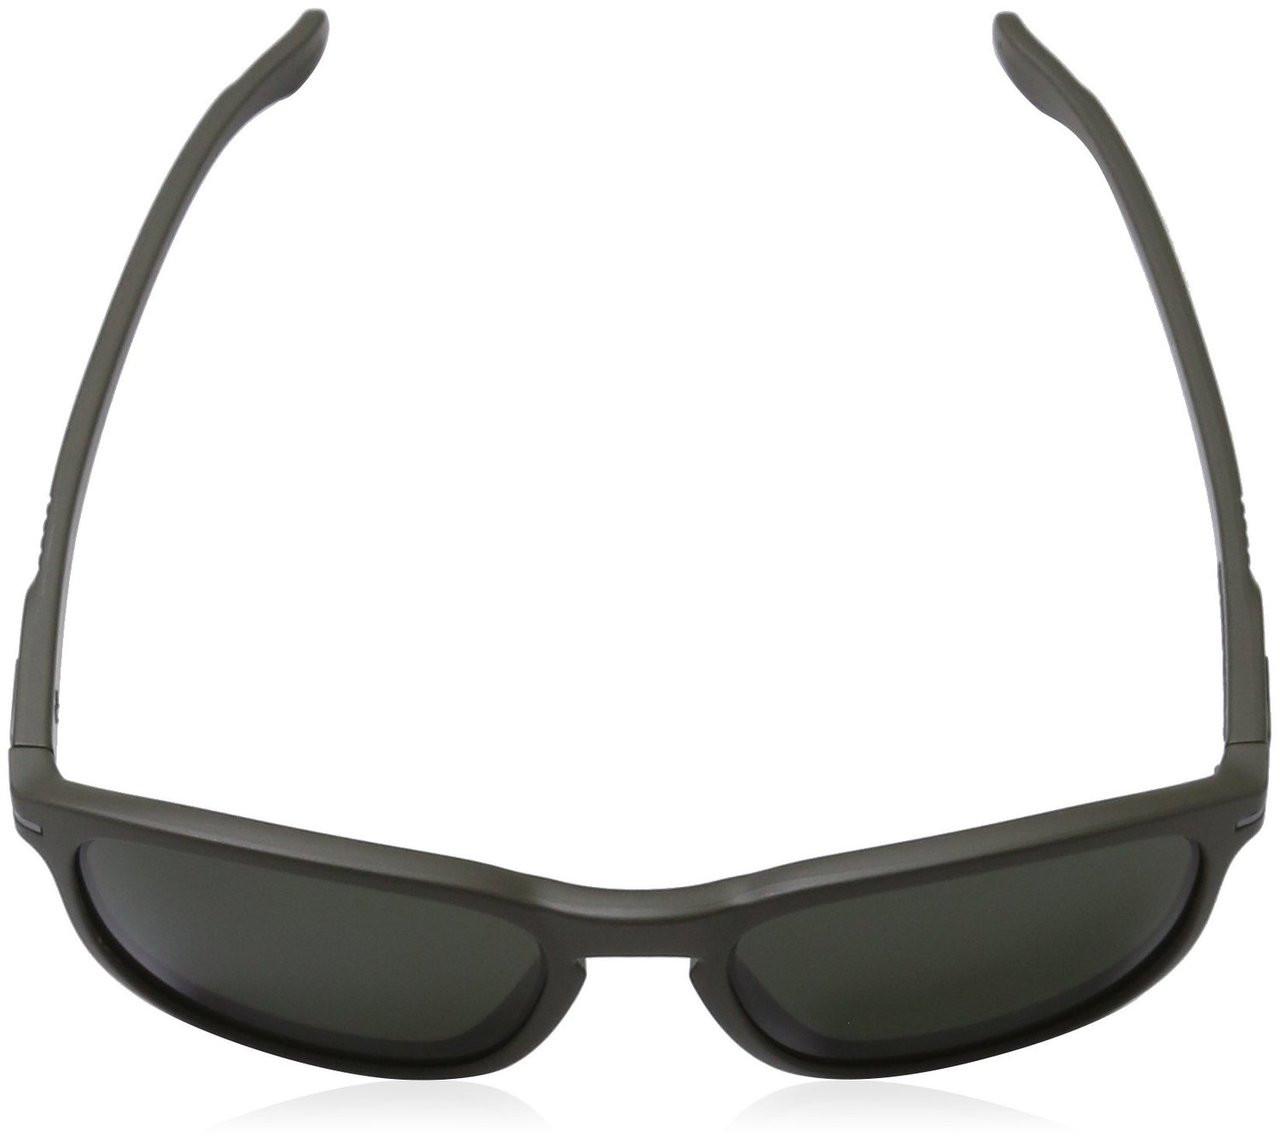 d924610a42e Oakley Designer Sunglasses Enduro in Olive Ink   Warm Grey Lens (OO9223-11)